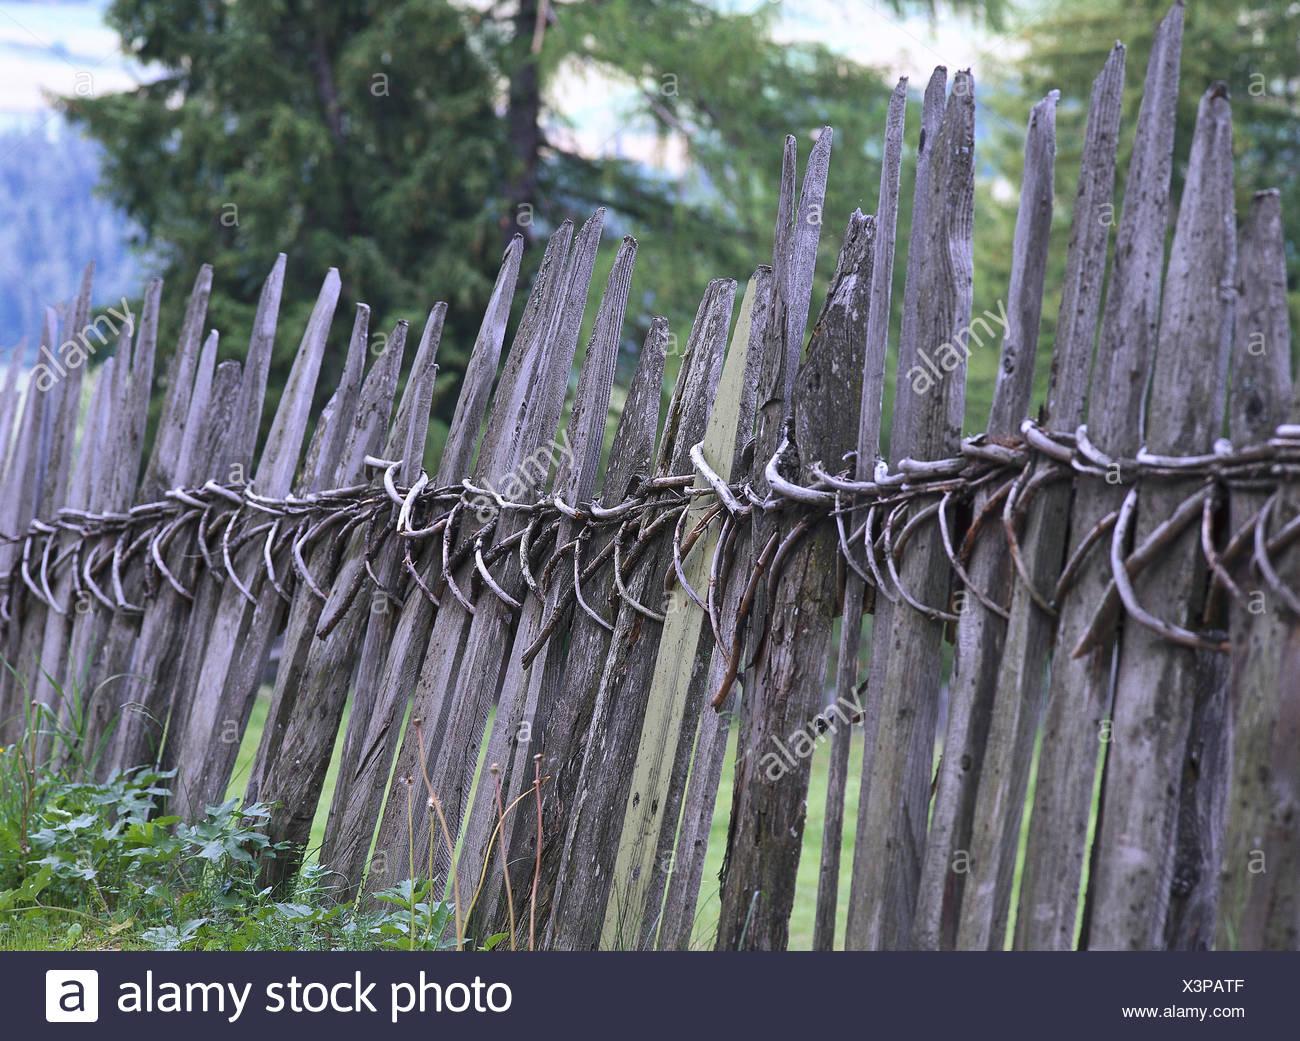 Italy, South Tyrol, Villnößtal, wooden fence, rurally, old, trees ...